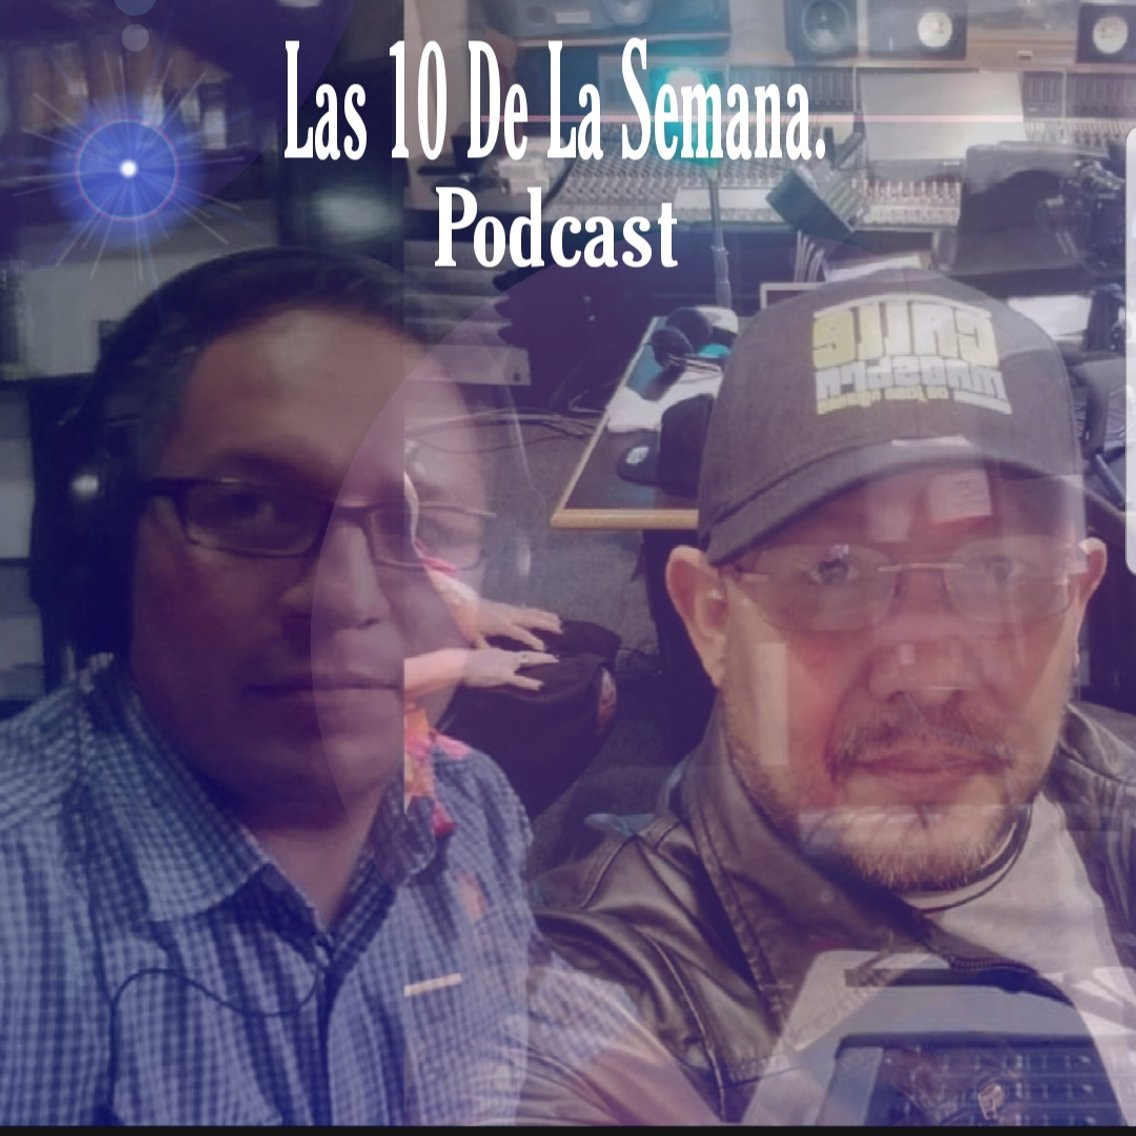 Las Diez De La Semana  Podcast  De Salsa - Cover Image